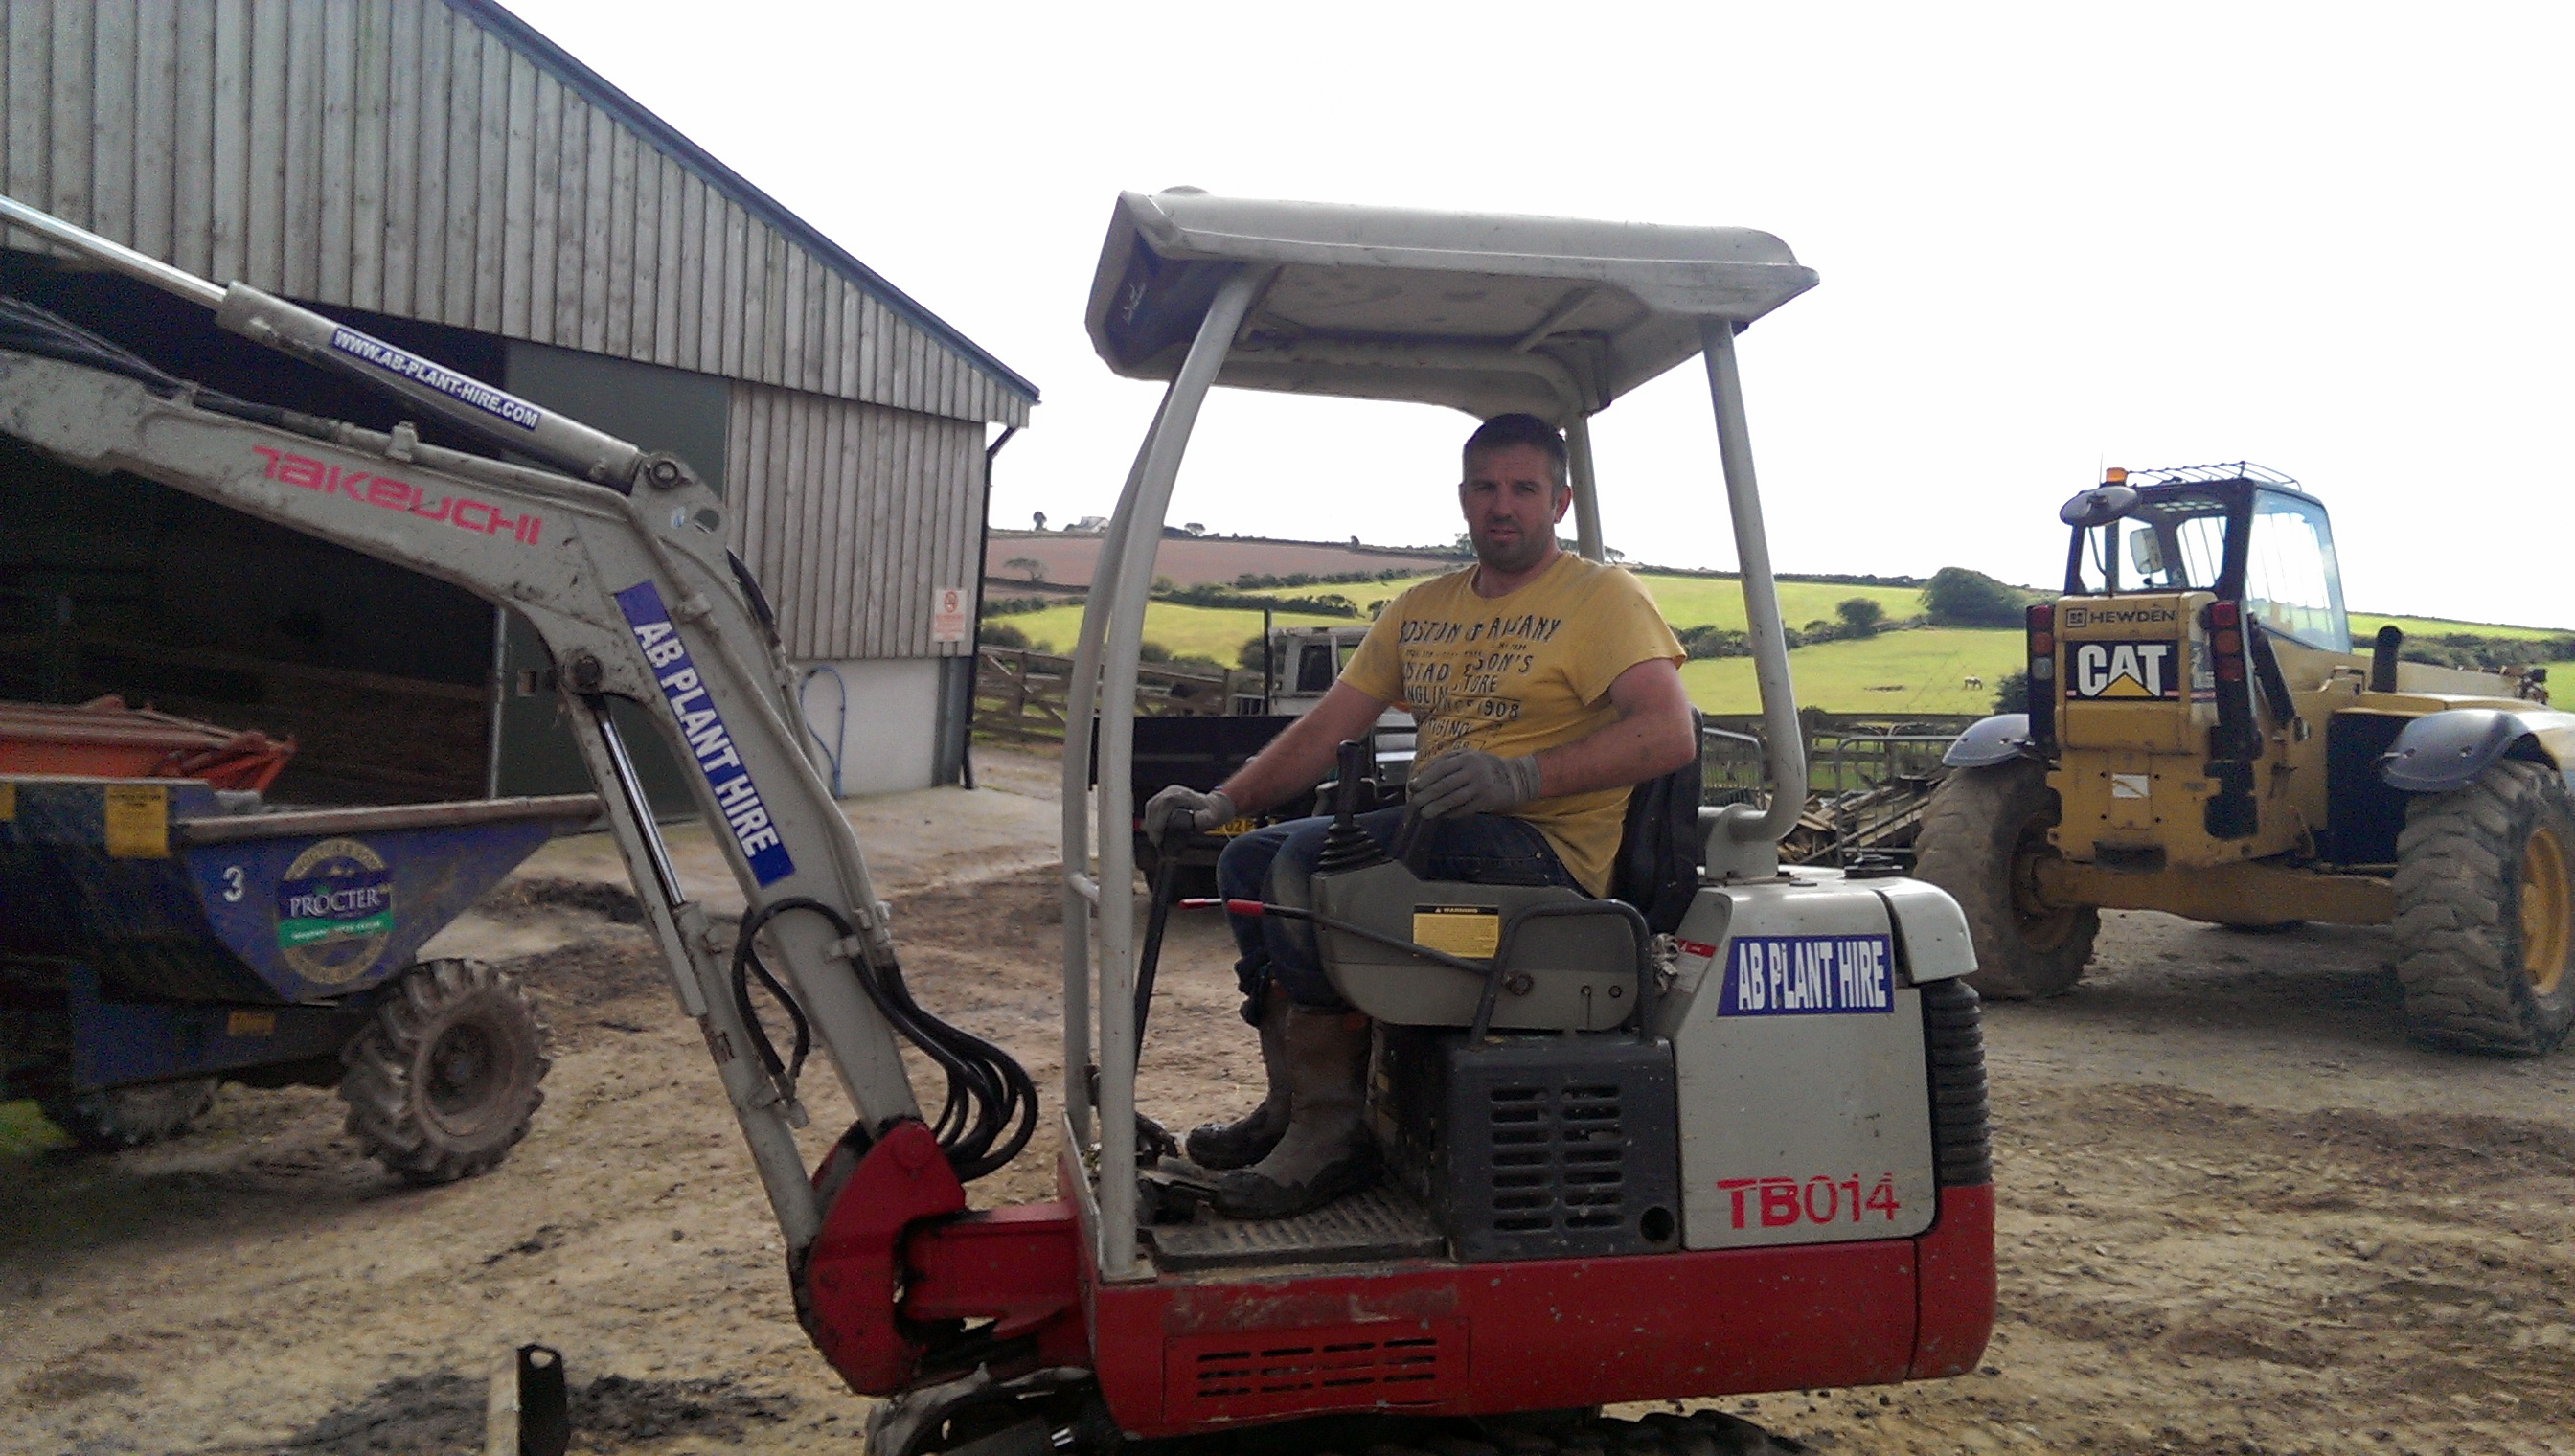 man sitting in a mini digger